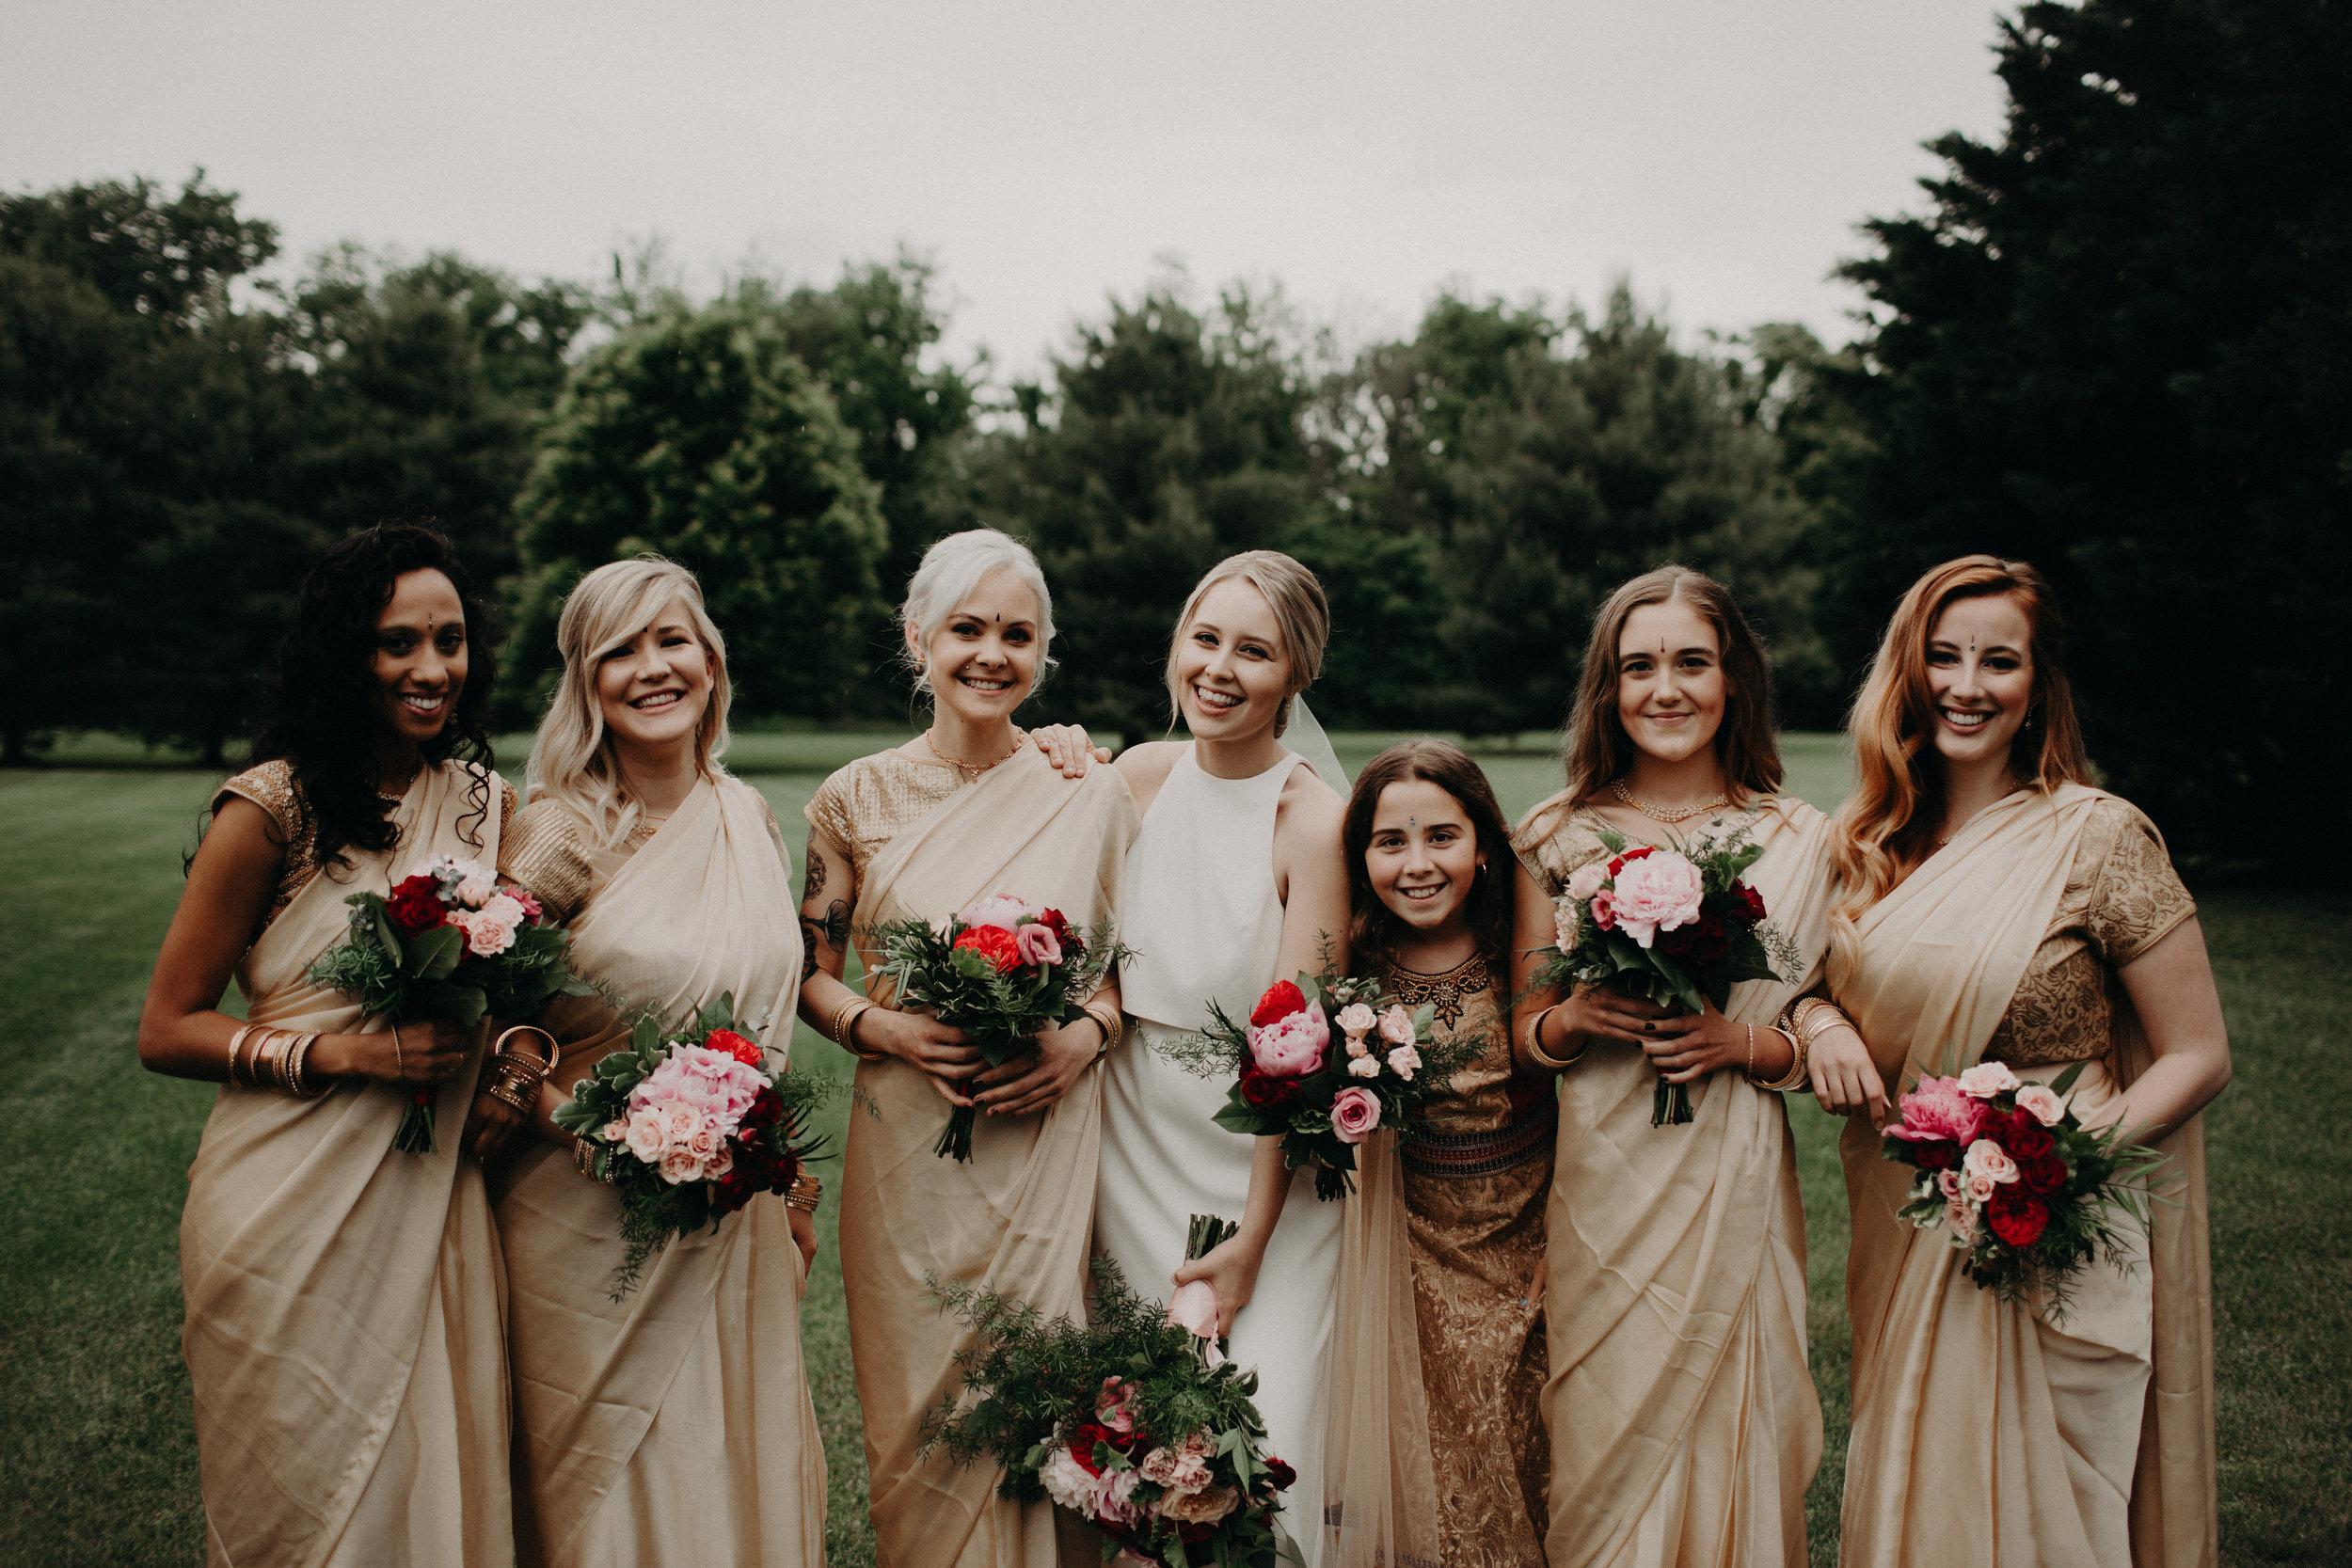 Bridesmaids wearing Sari for Indian fusion wedding